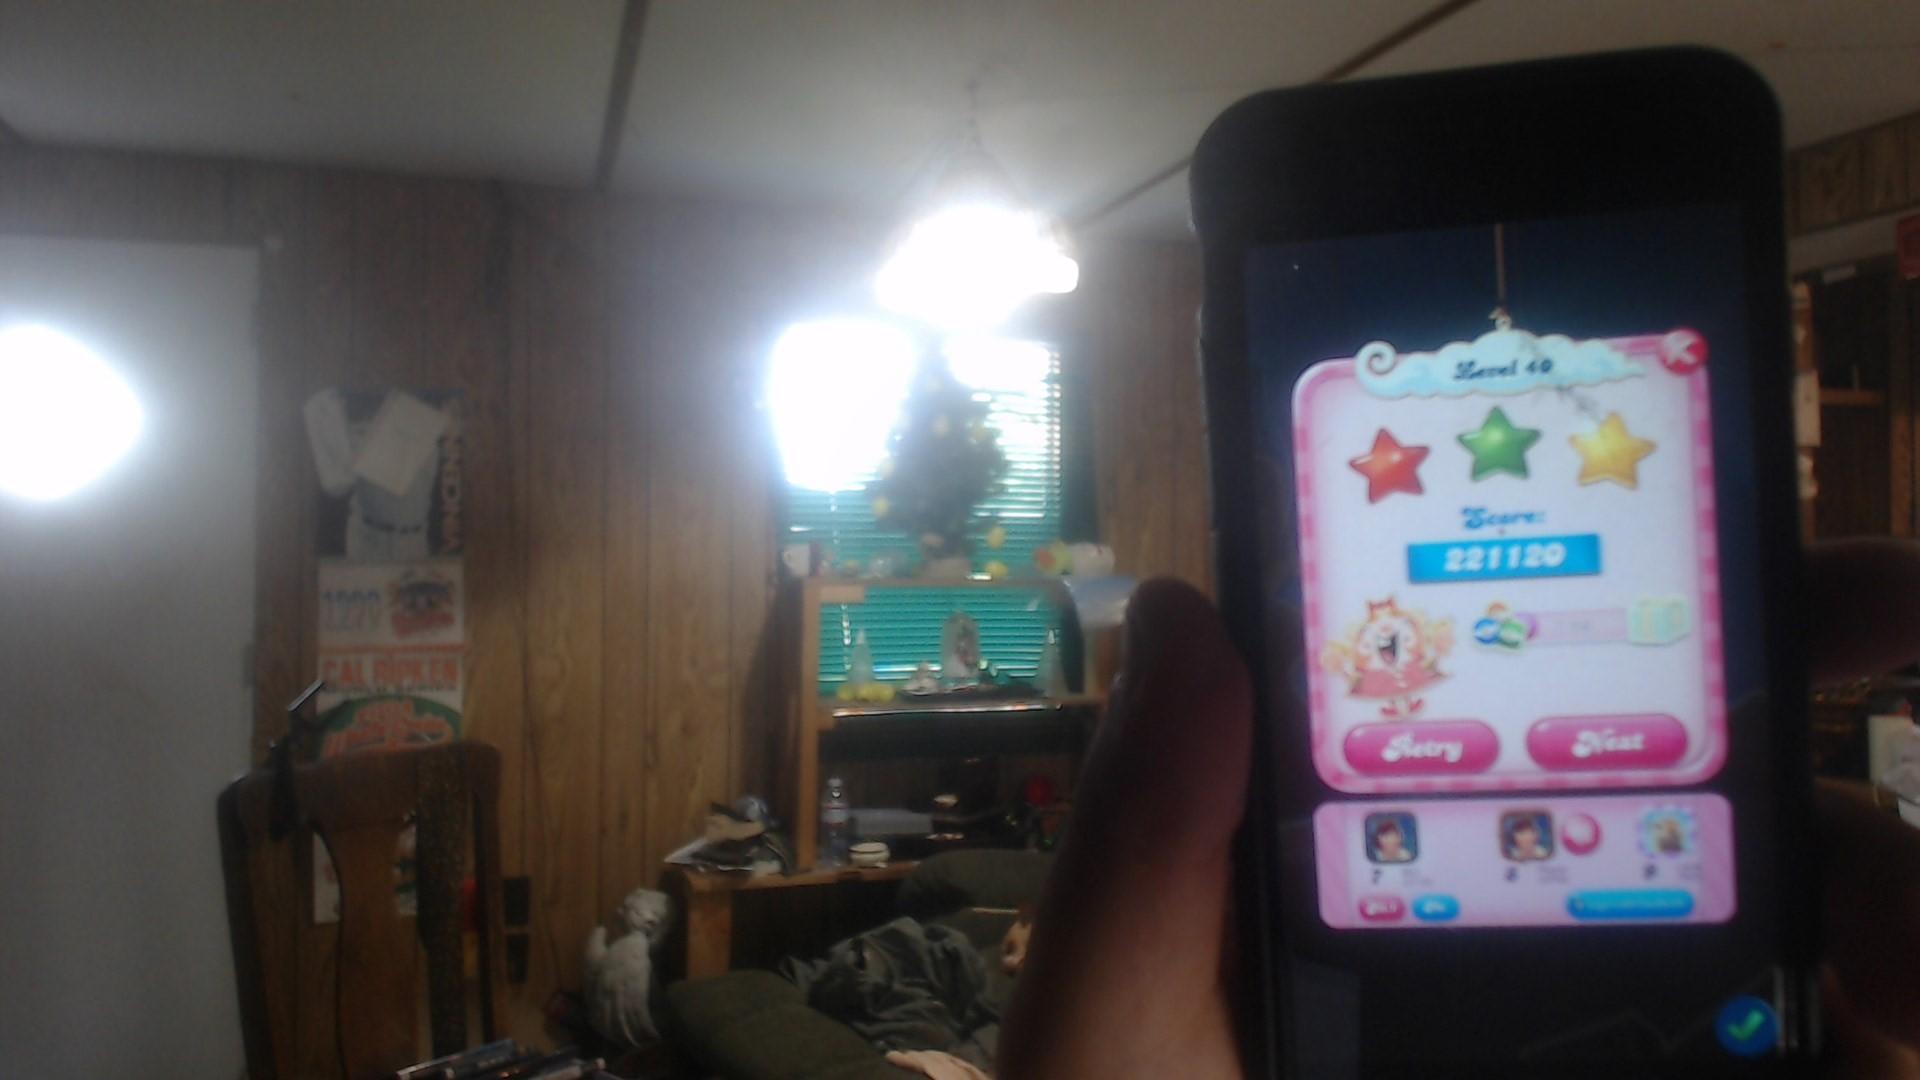 speedy4759123: Candy Crush Saga: Level 040 (iOS) 221,120 points on 2019-07-17 11:06:11